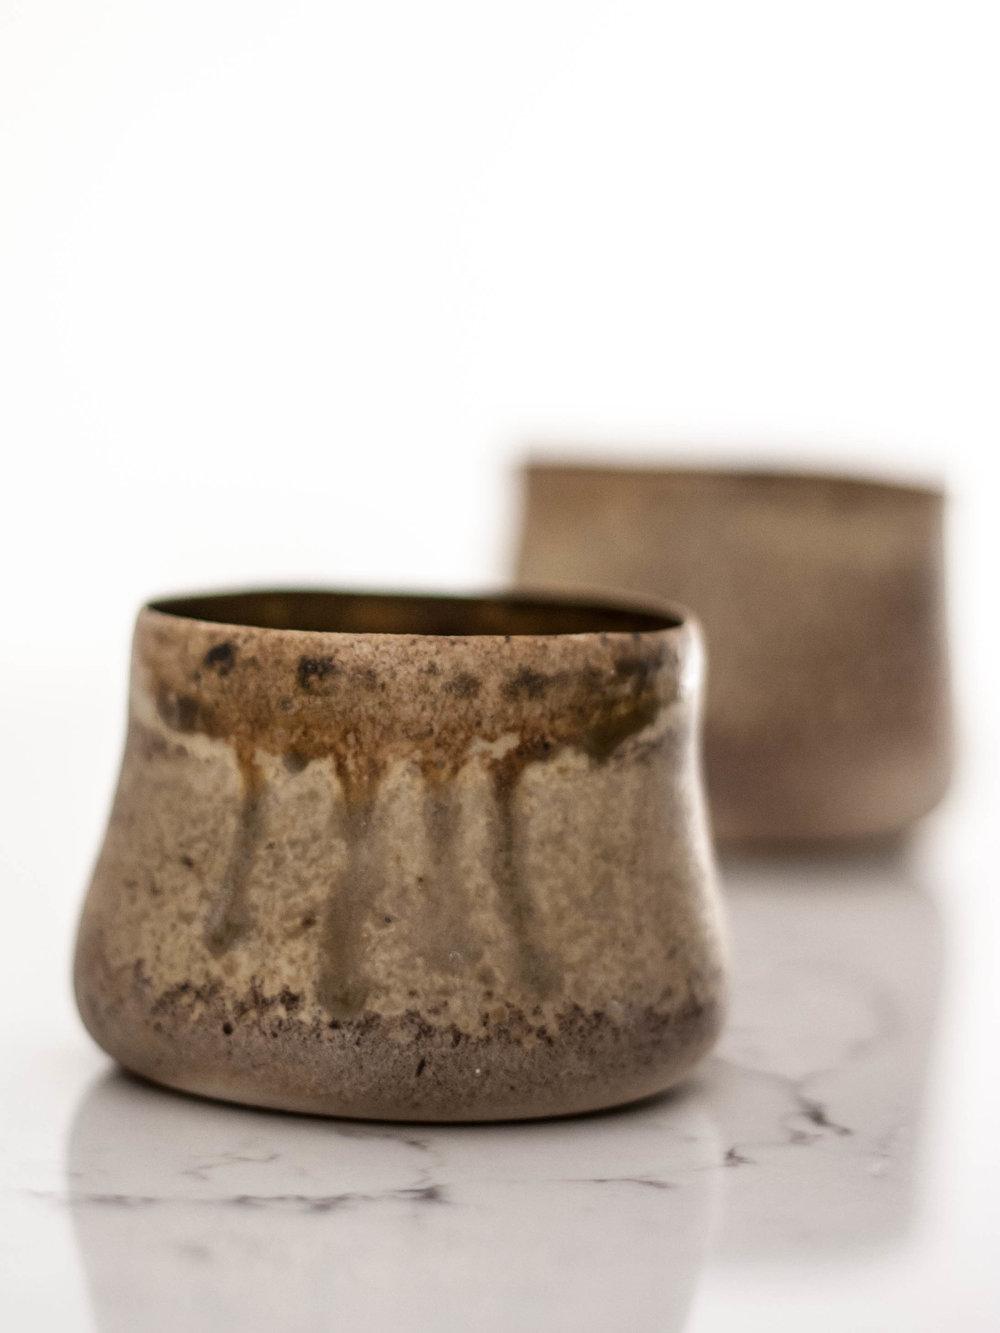 Porcelain, Wood Fired. NFS